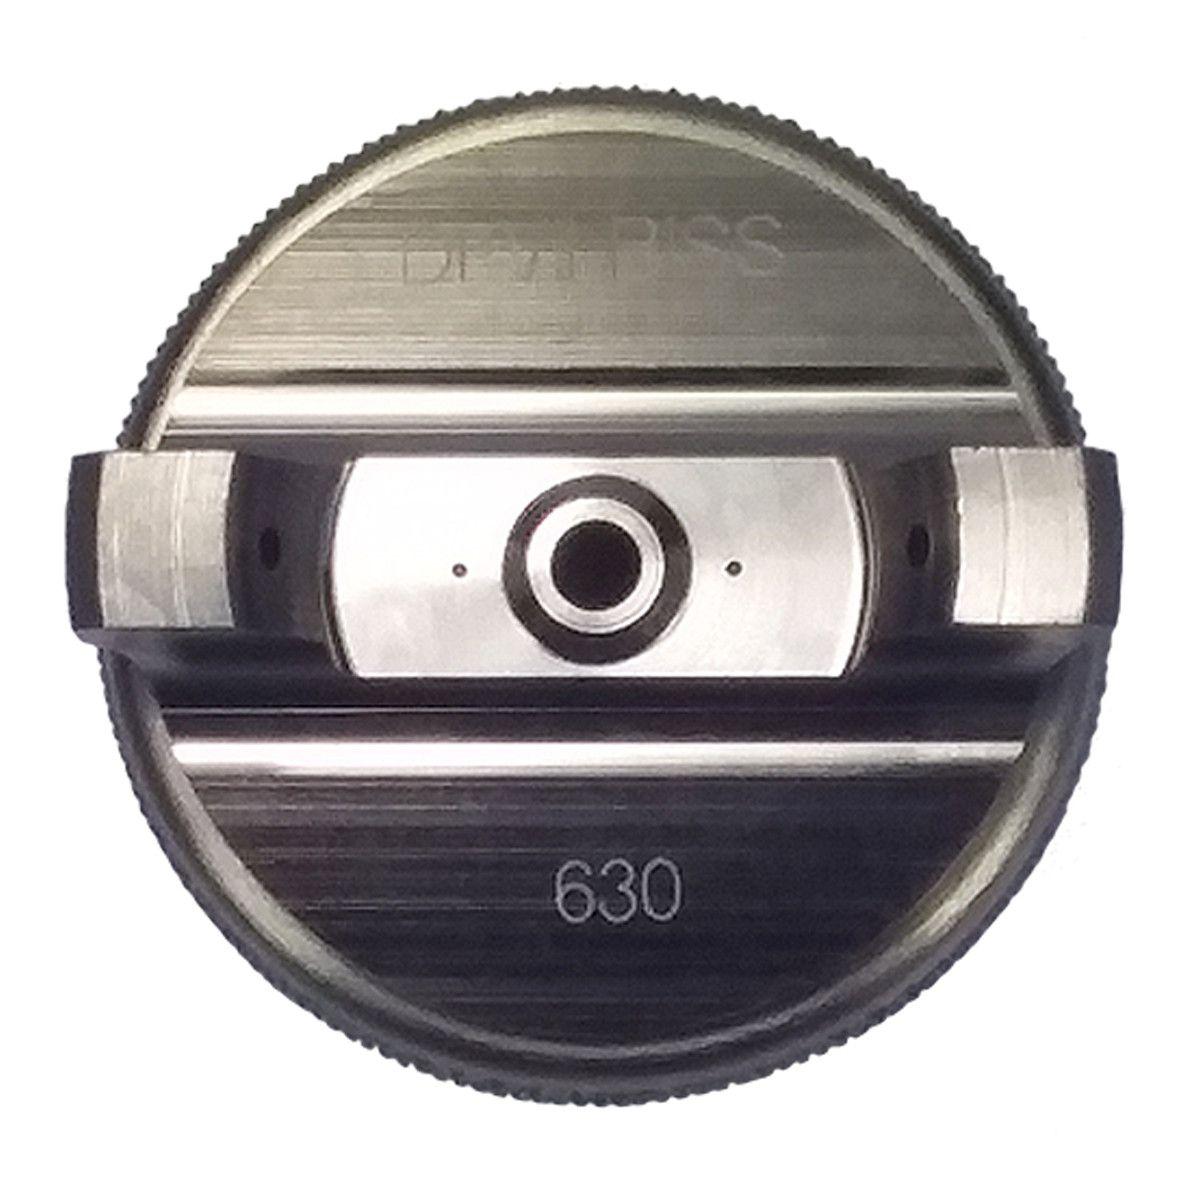 CAPA DE AR N 630 SGK-0054-630 DEVILBISS